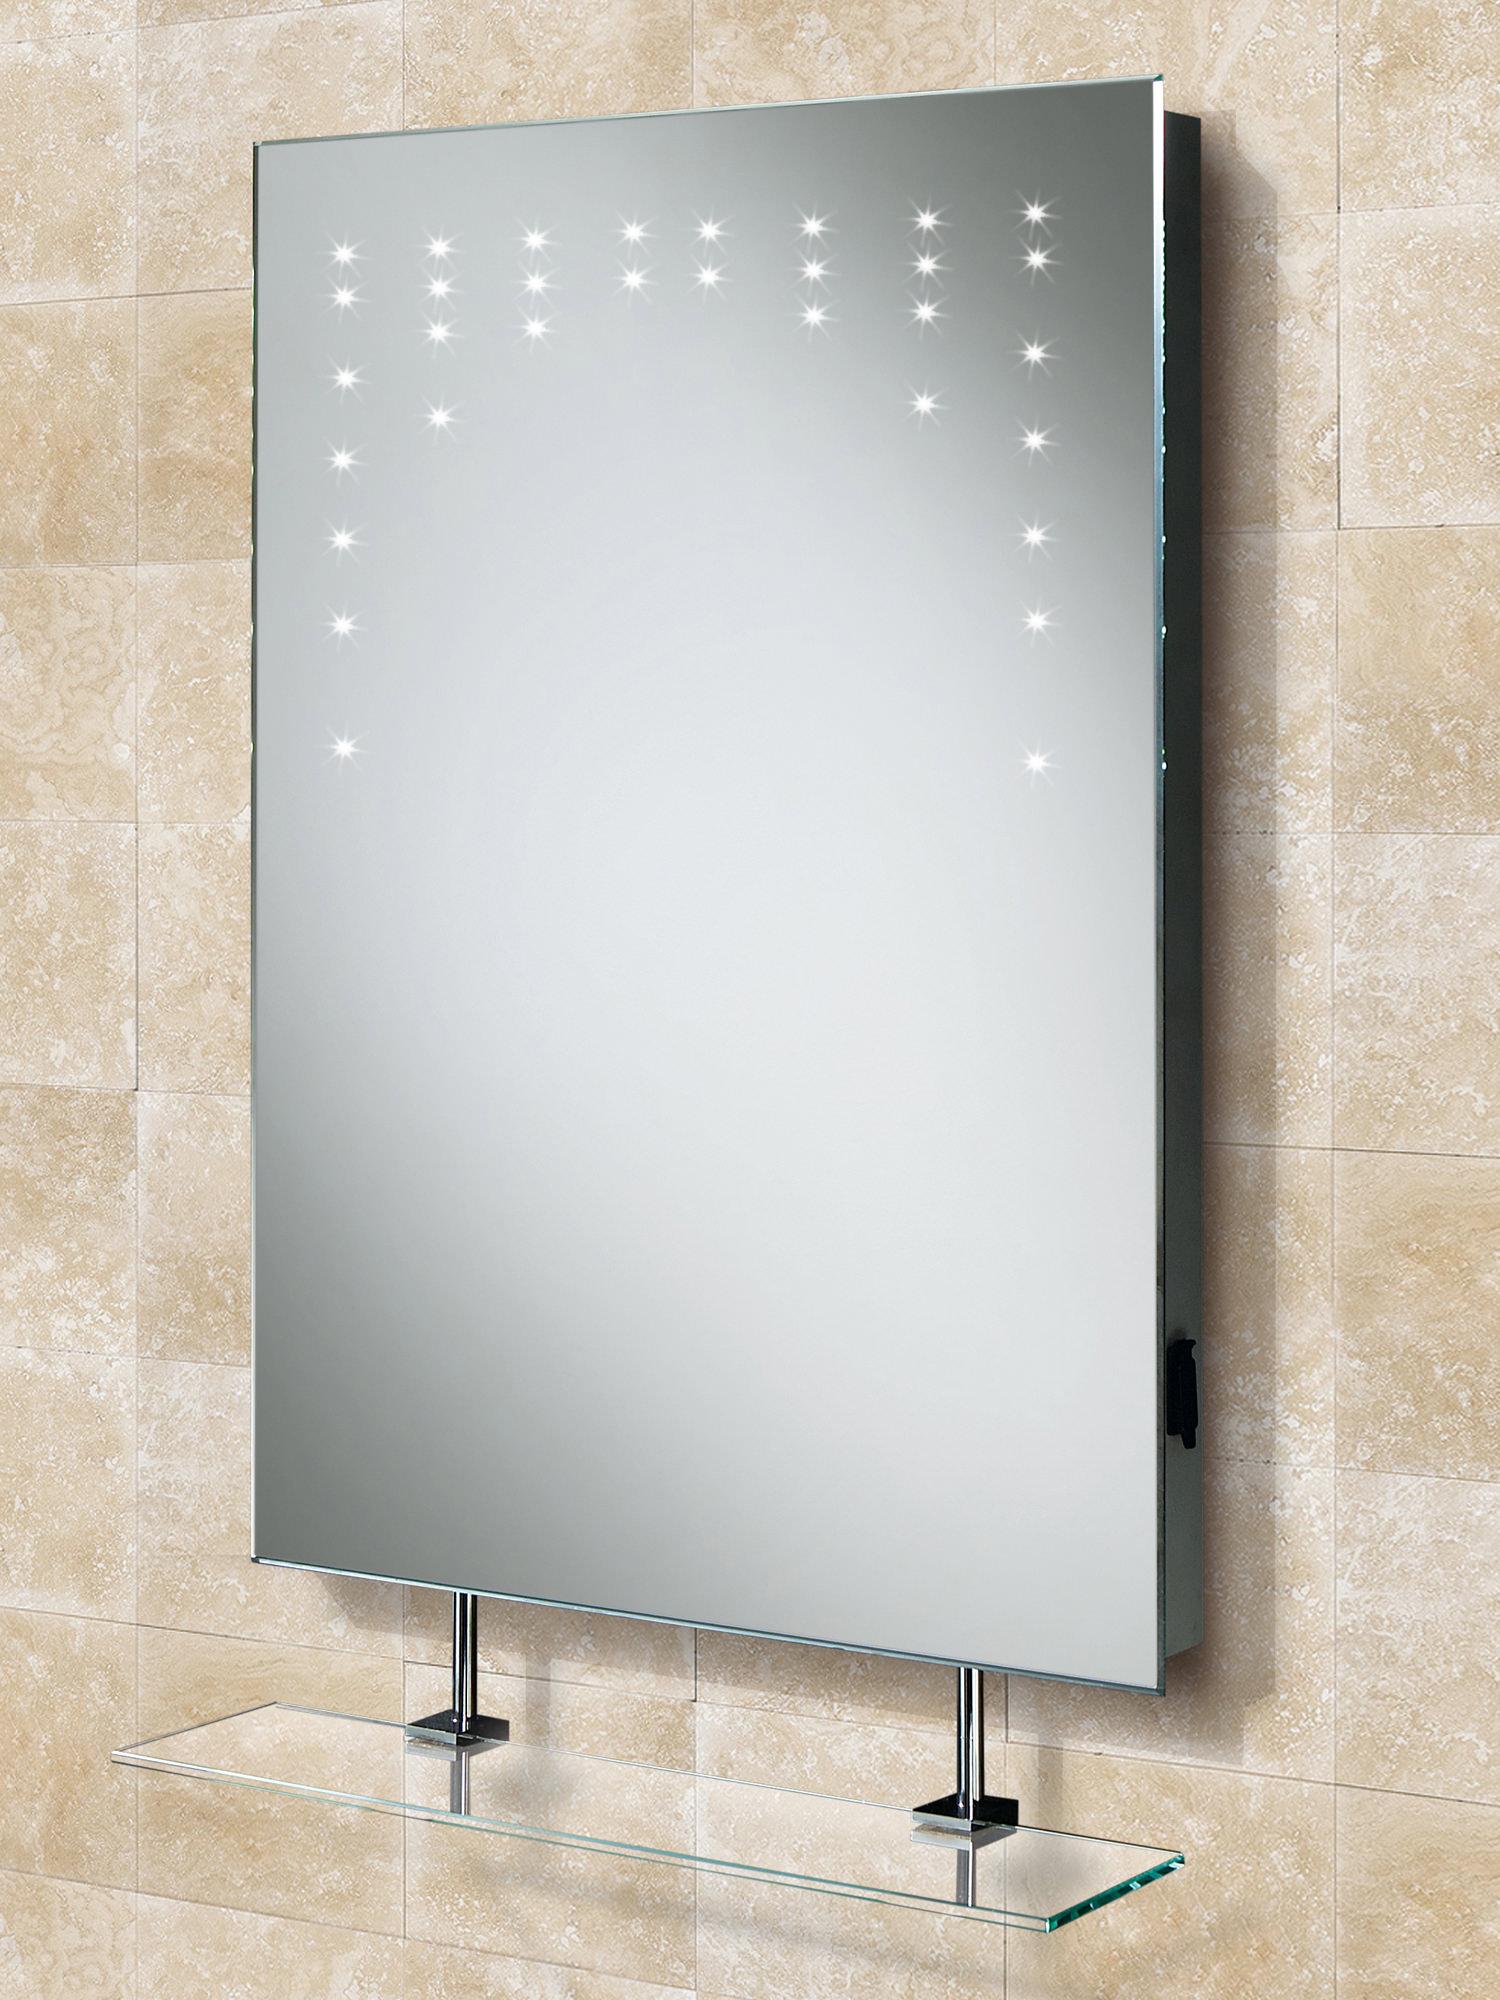 hib rain led mirror with glass shelf and shaver socket 500. Black Bedroom Furniture Sets. Home Design Ideas